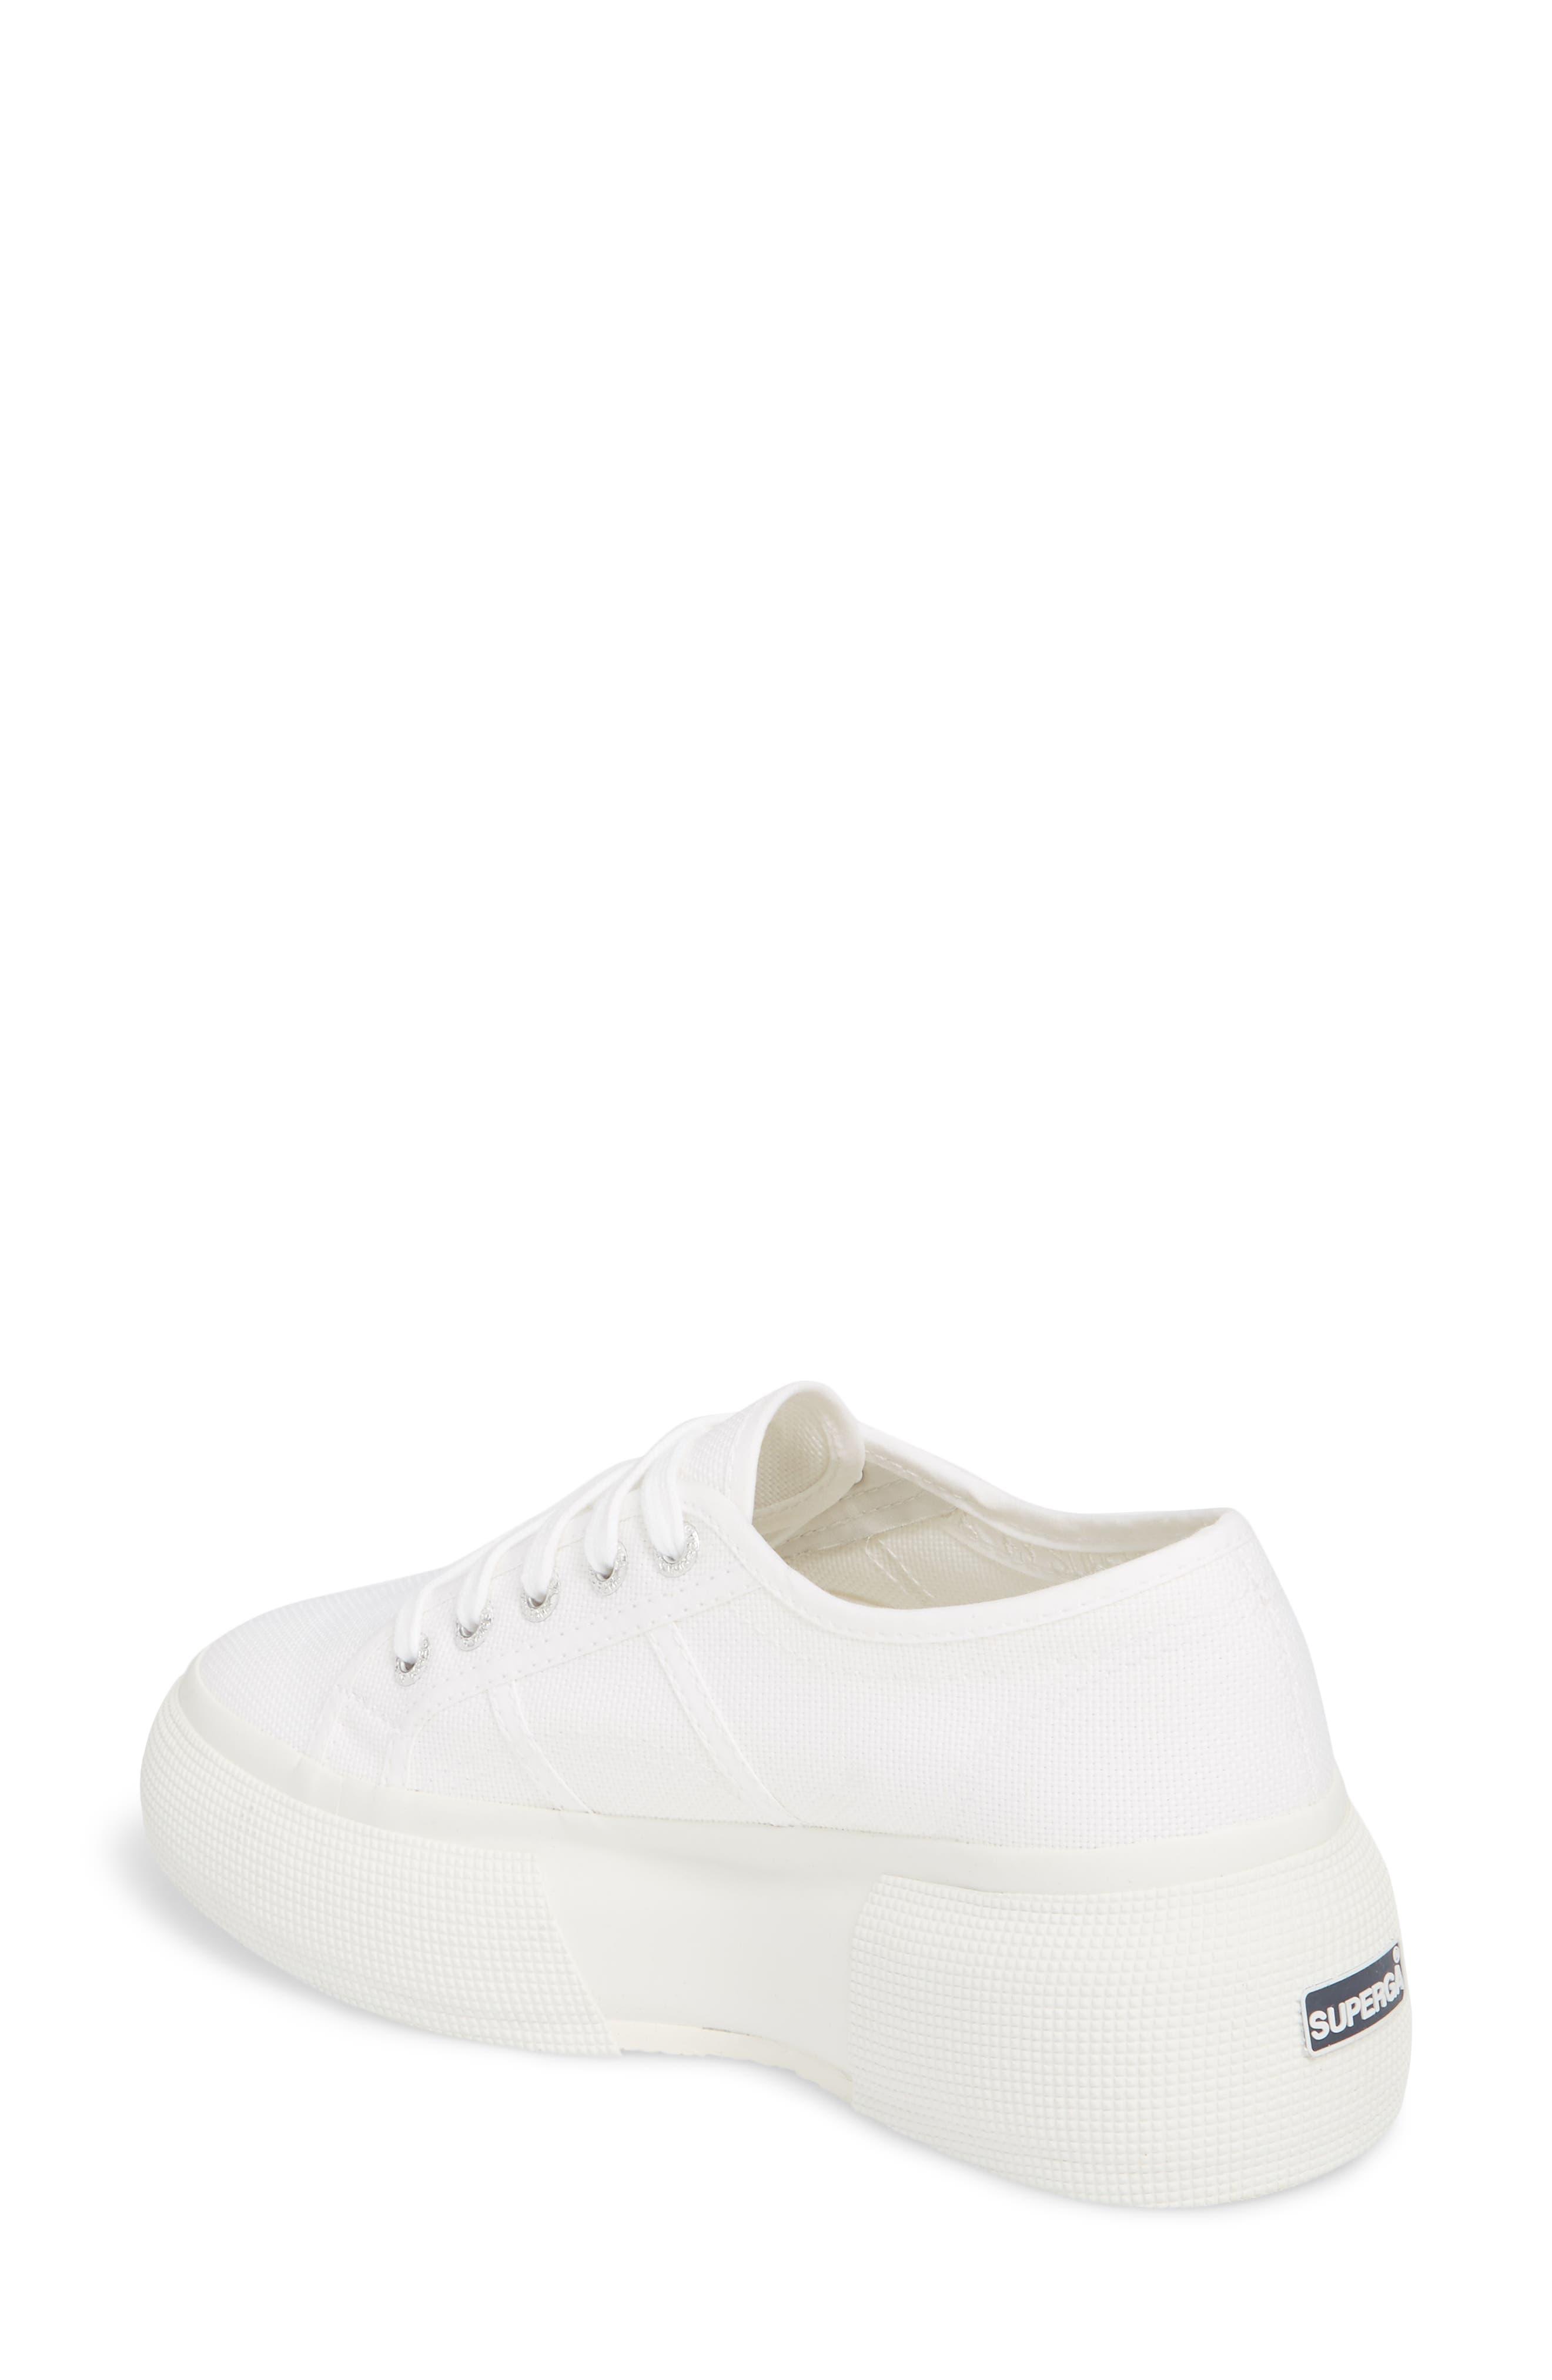 2287 Cotu Platform Sneaker,                             Alternate thumbnail 3, color,